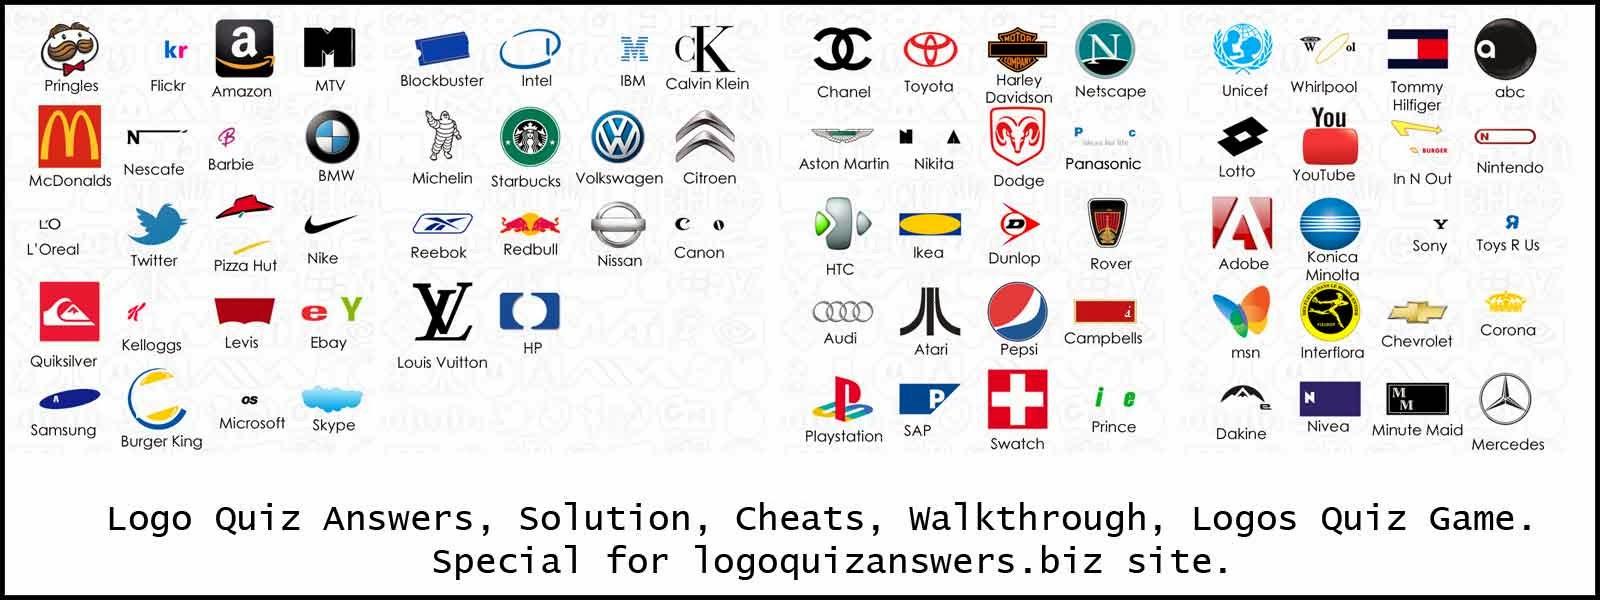 Connu 3D Logo Quiz Game Answers   Logo Wallpaper RK75